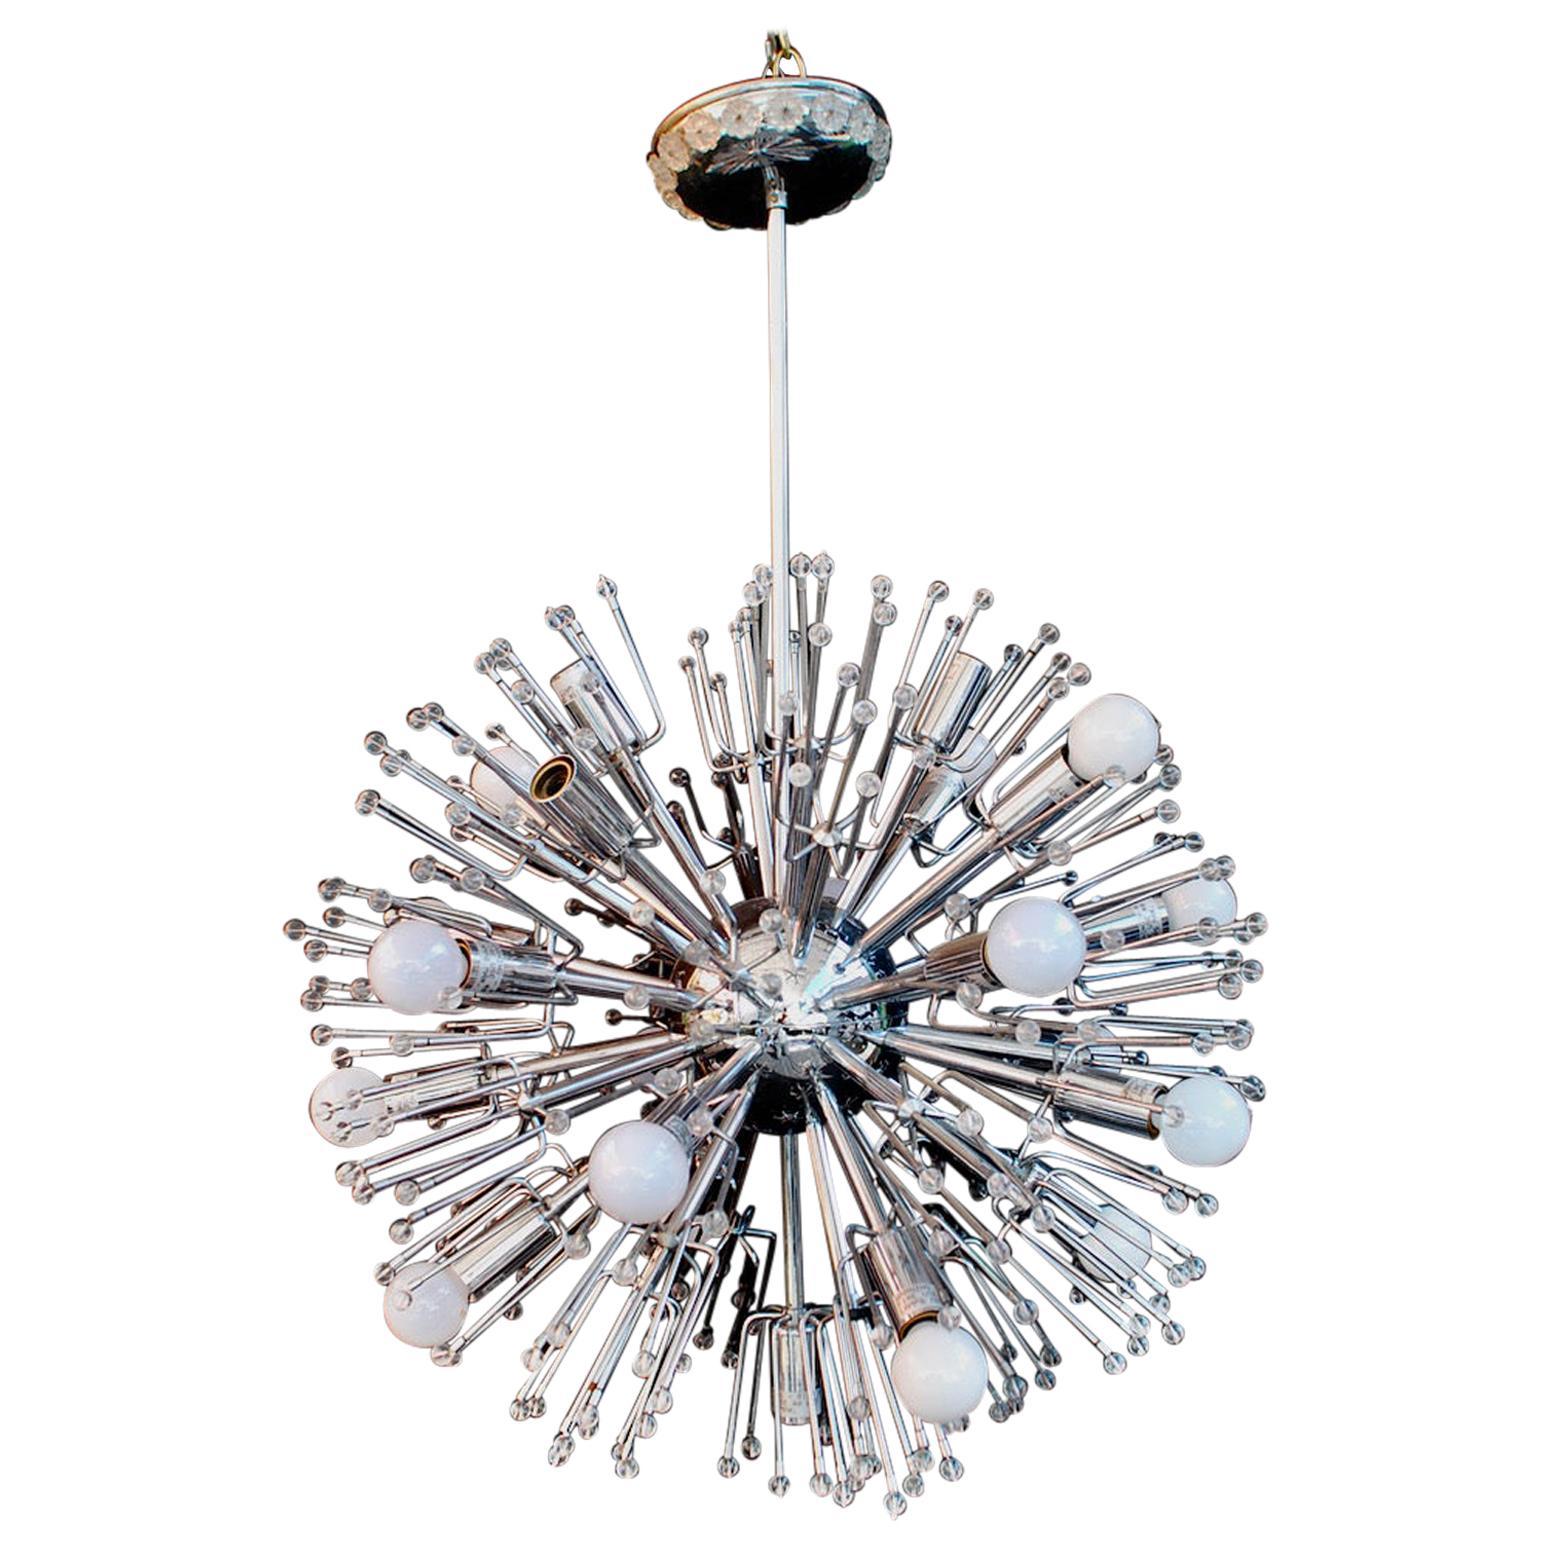 Sexy 1960's Sputnik Light by Emil Stejnar